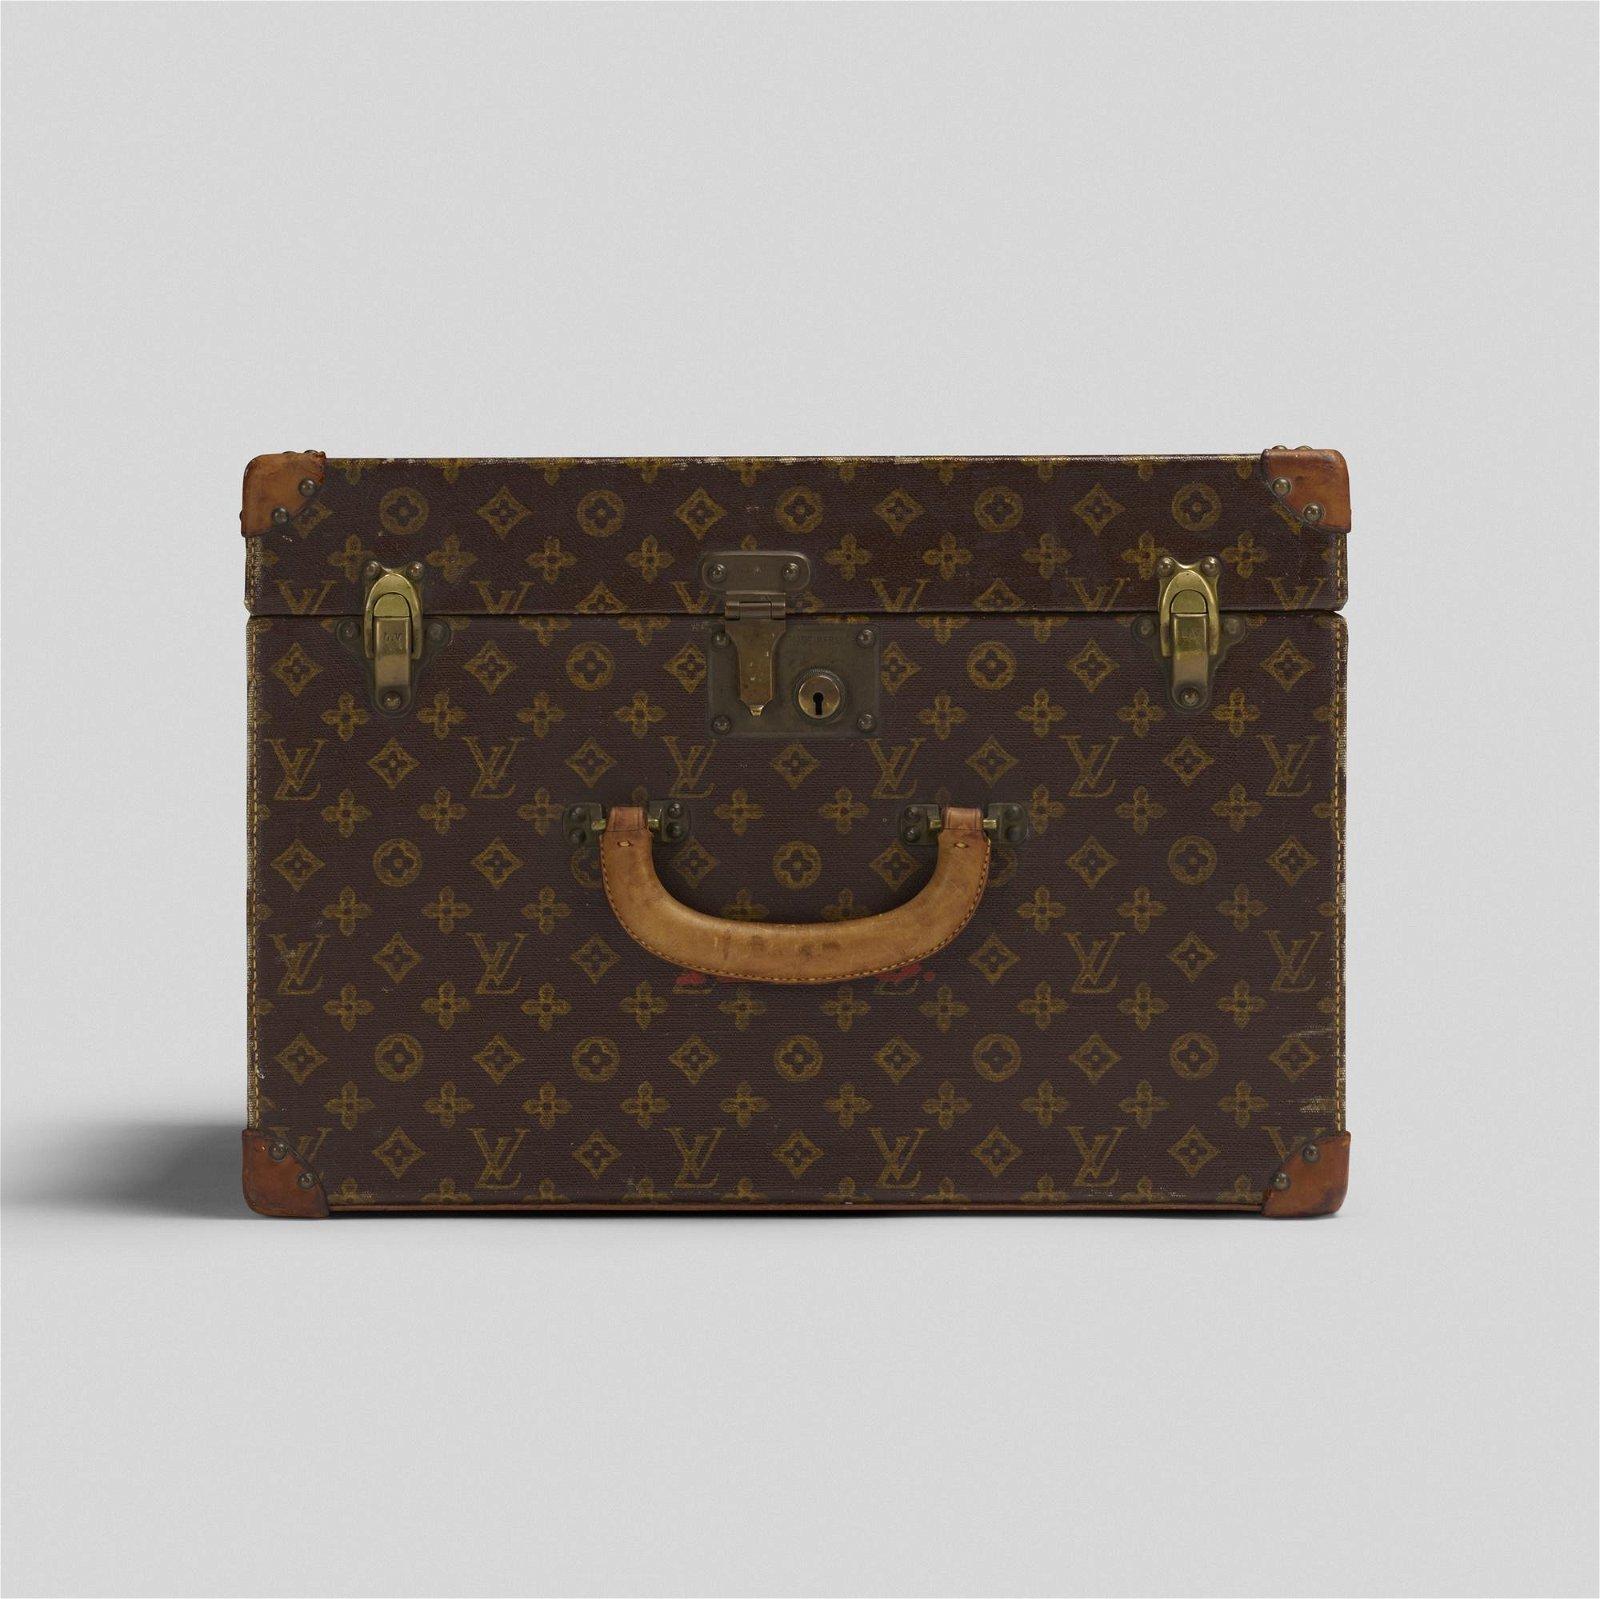 Louis Vuitton, trunk